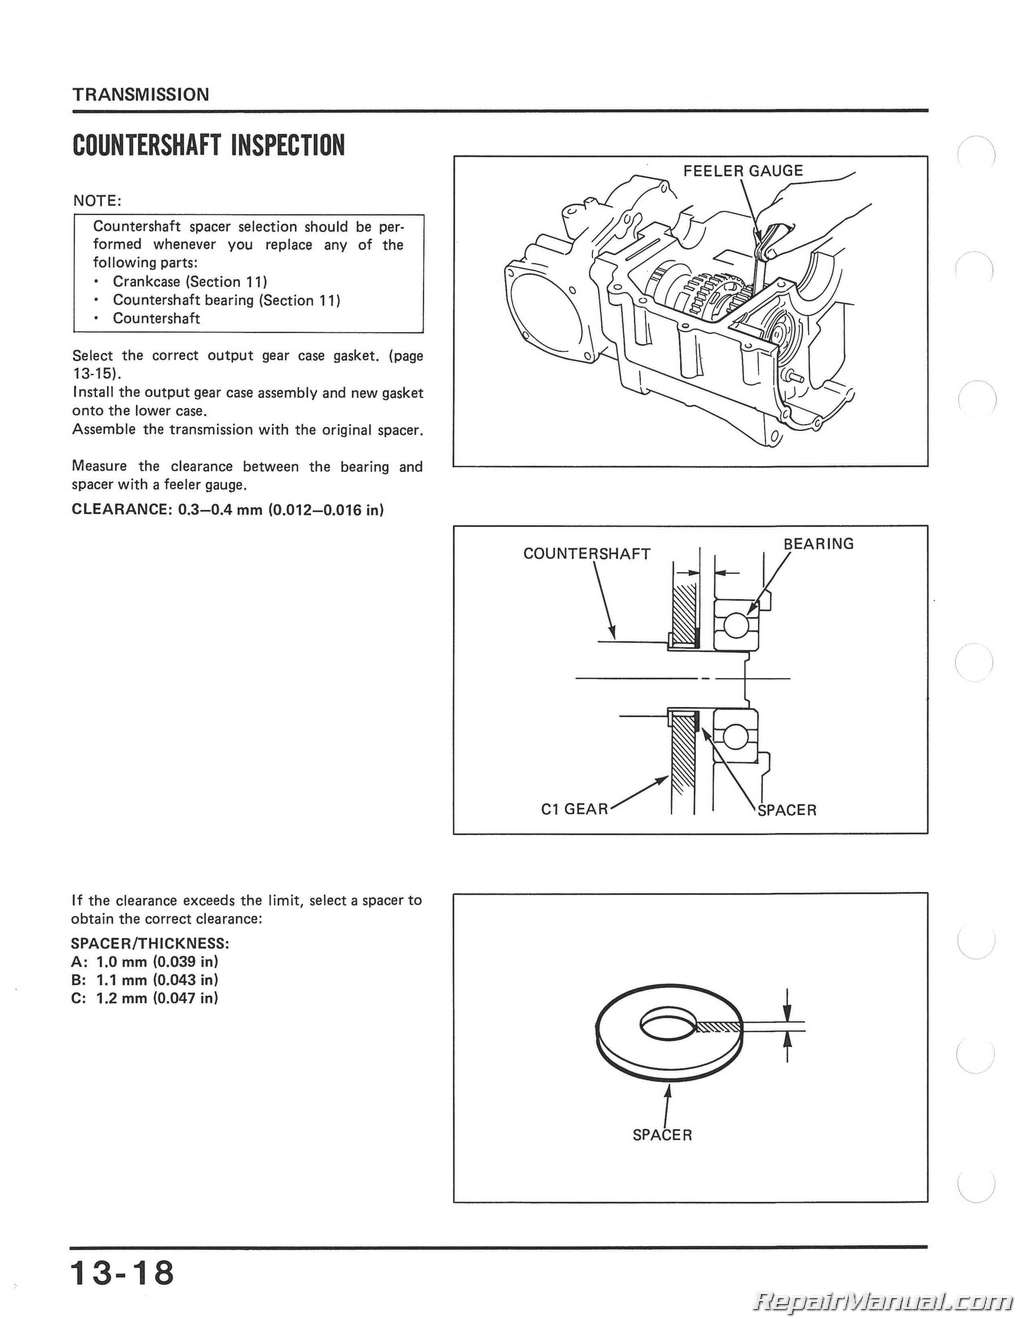 1984 honda magna v45 wiring diagram schematic 1982 - 1985 honda vf700c magna, vf750s v45 sabre motorcycle service manual